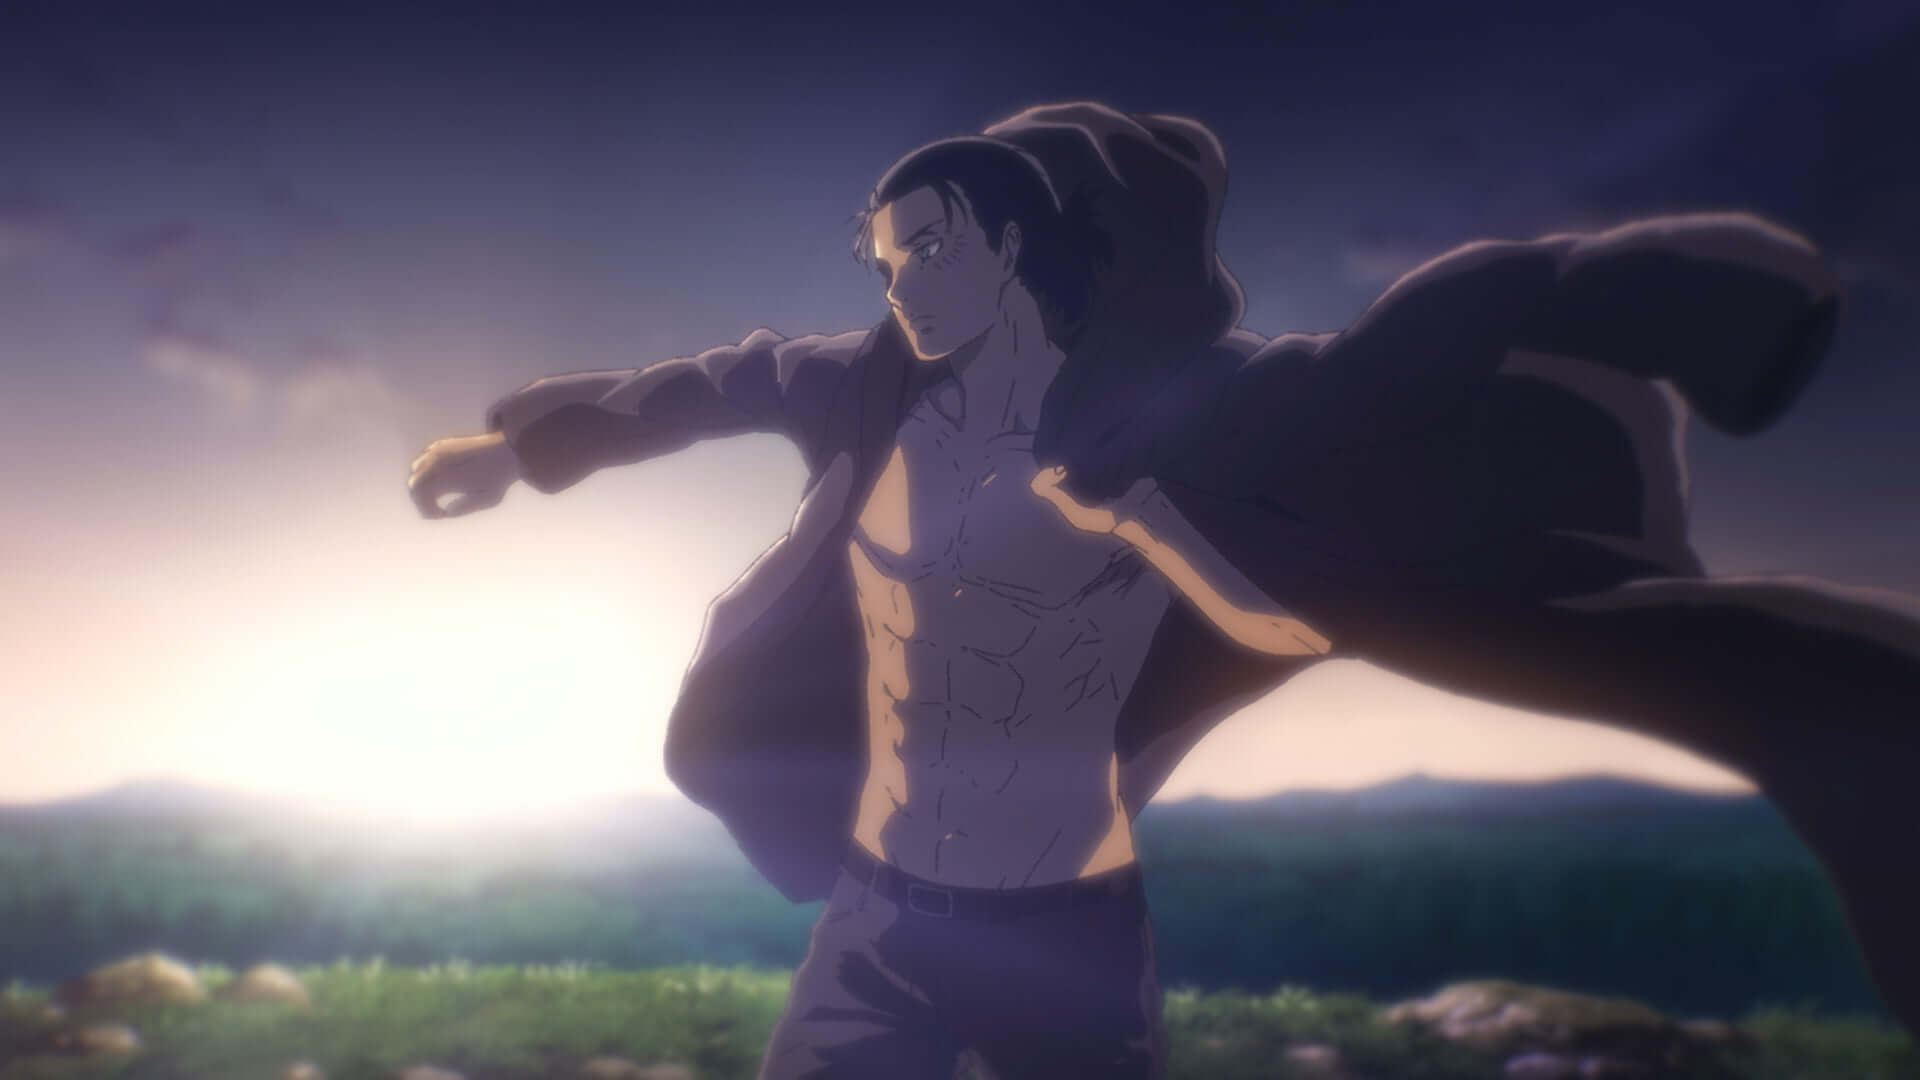 Netflixにアニメ『進撃の巨人』最終章や劇場版『銀魂』など続々追加!『トランスフォーマー』や『PSYCHO-PASS サイコパス』の最新作も art201127_netflix_5-1920x1080